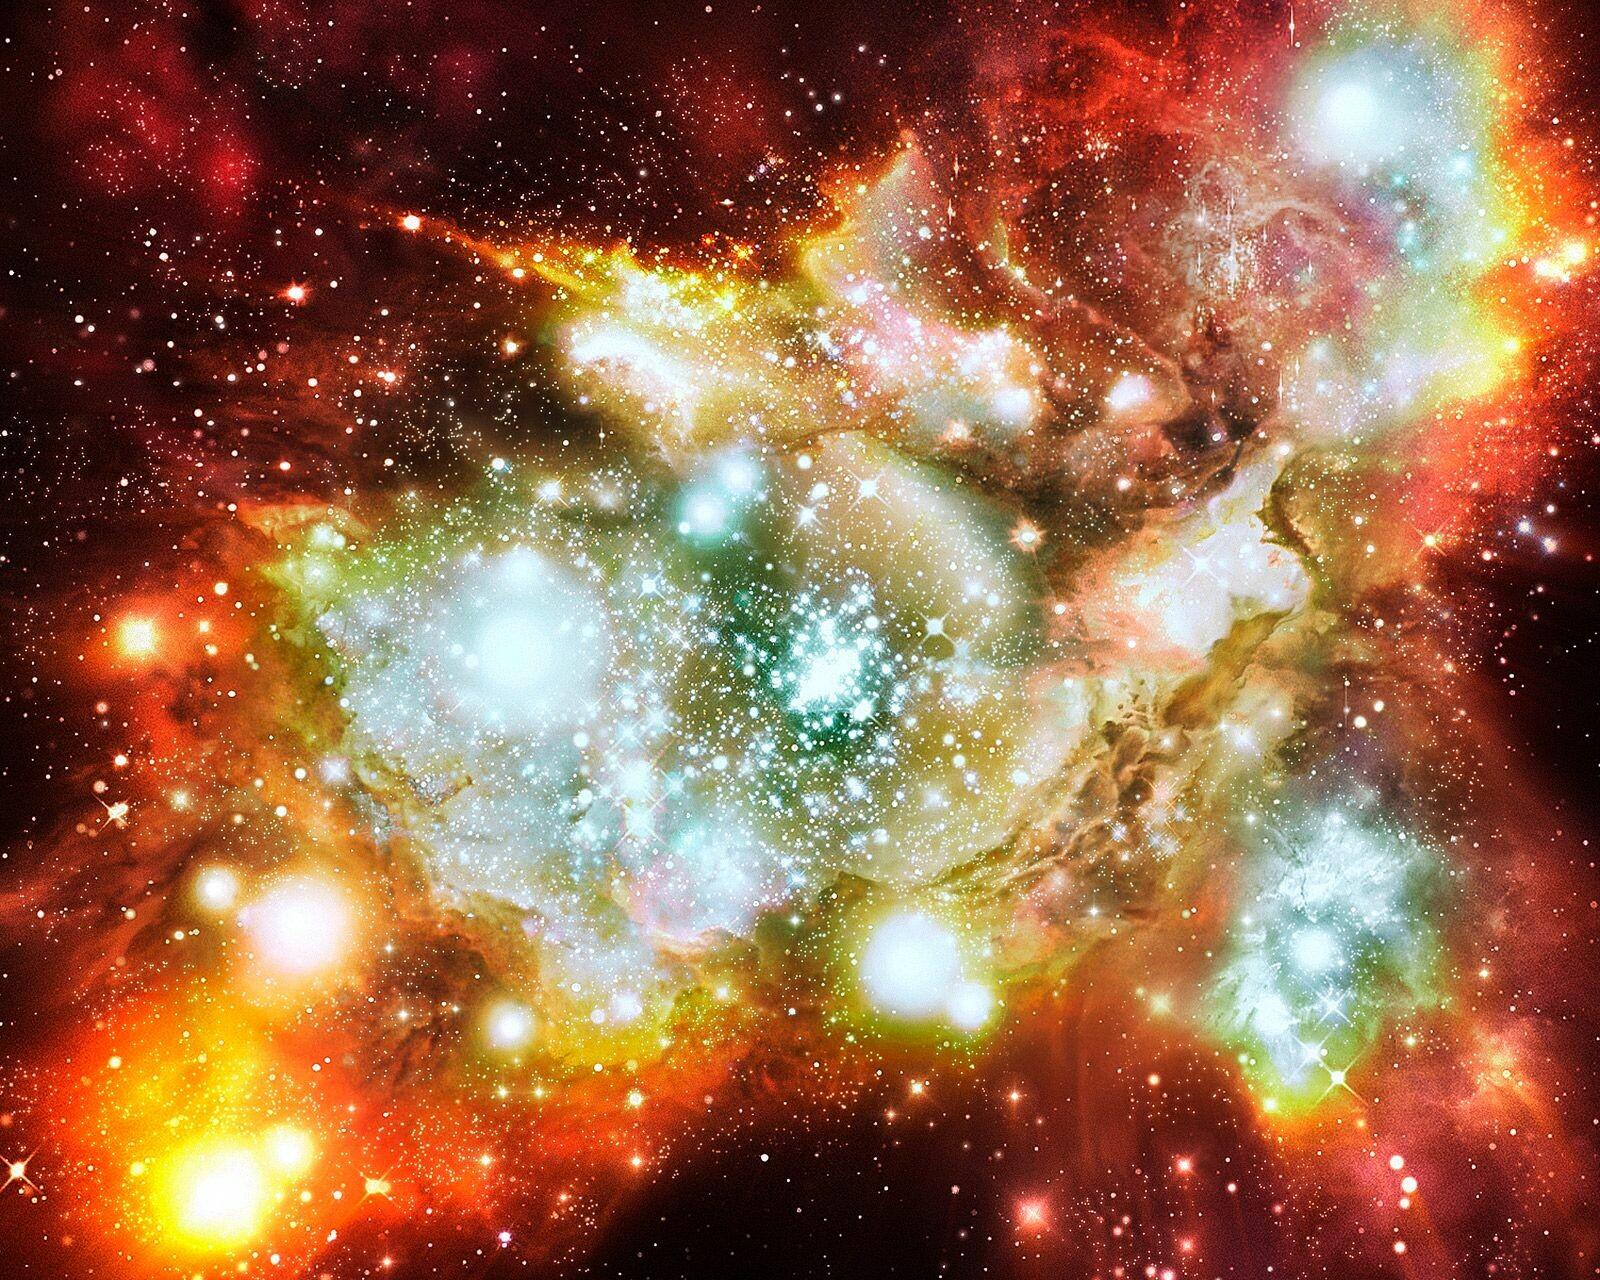 Lynx arc (Artist's Impression, NASA/JPL - Caltech) - Hubble Telescope